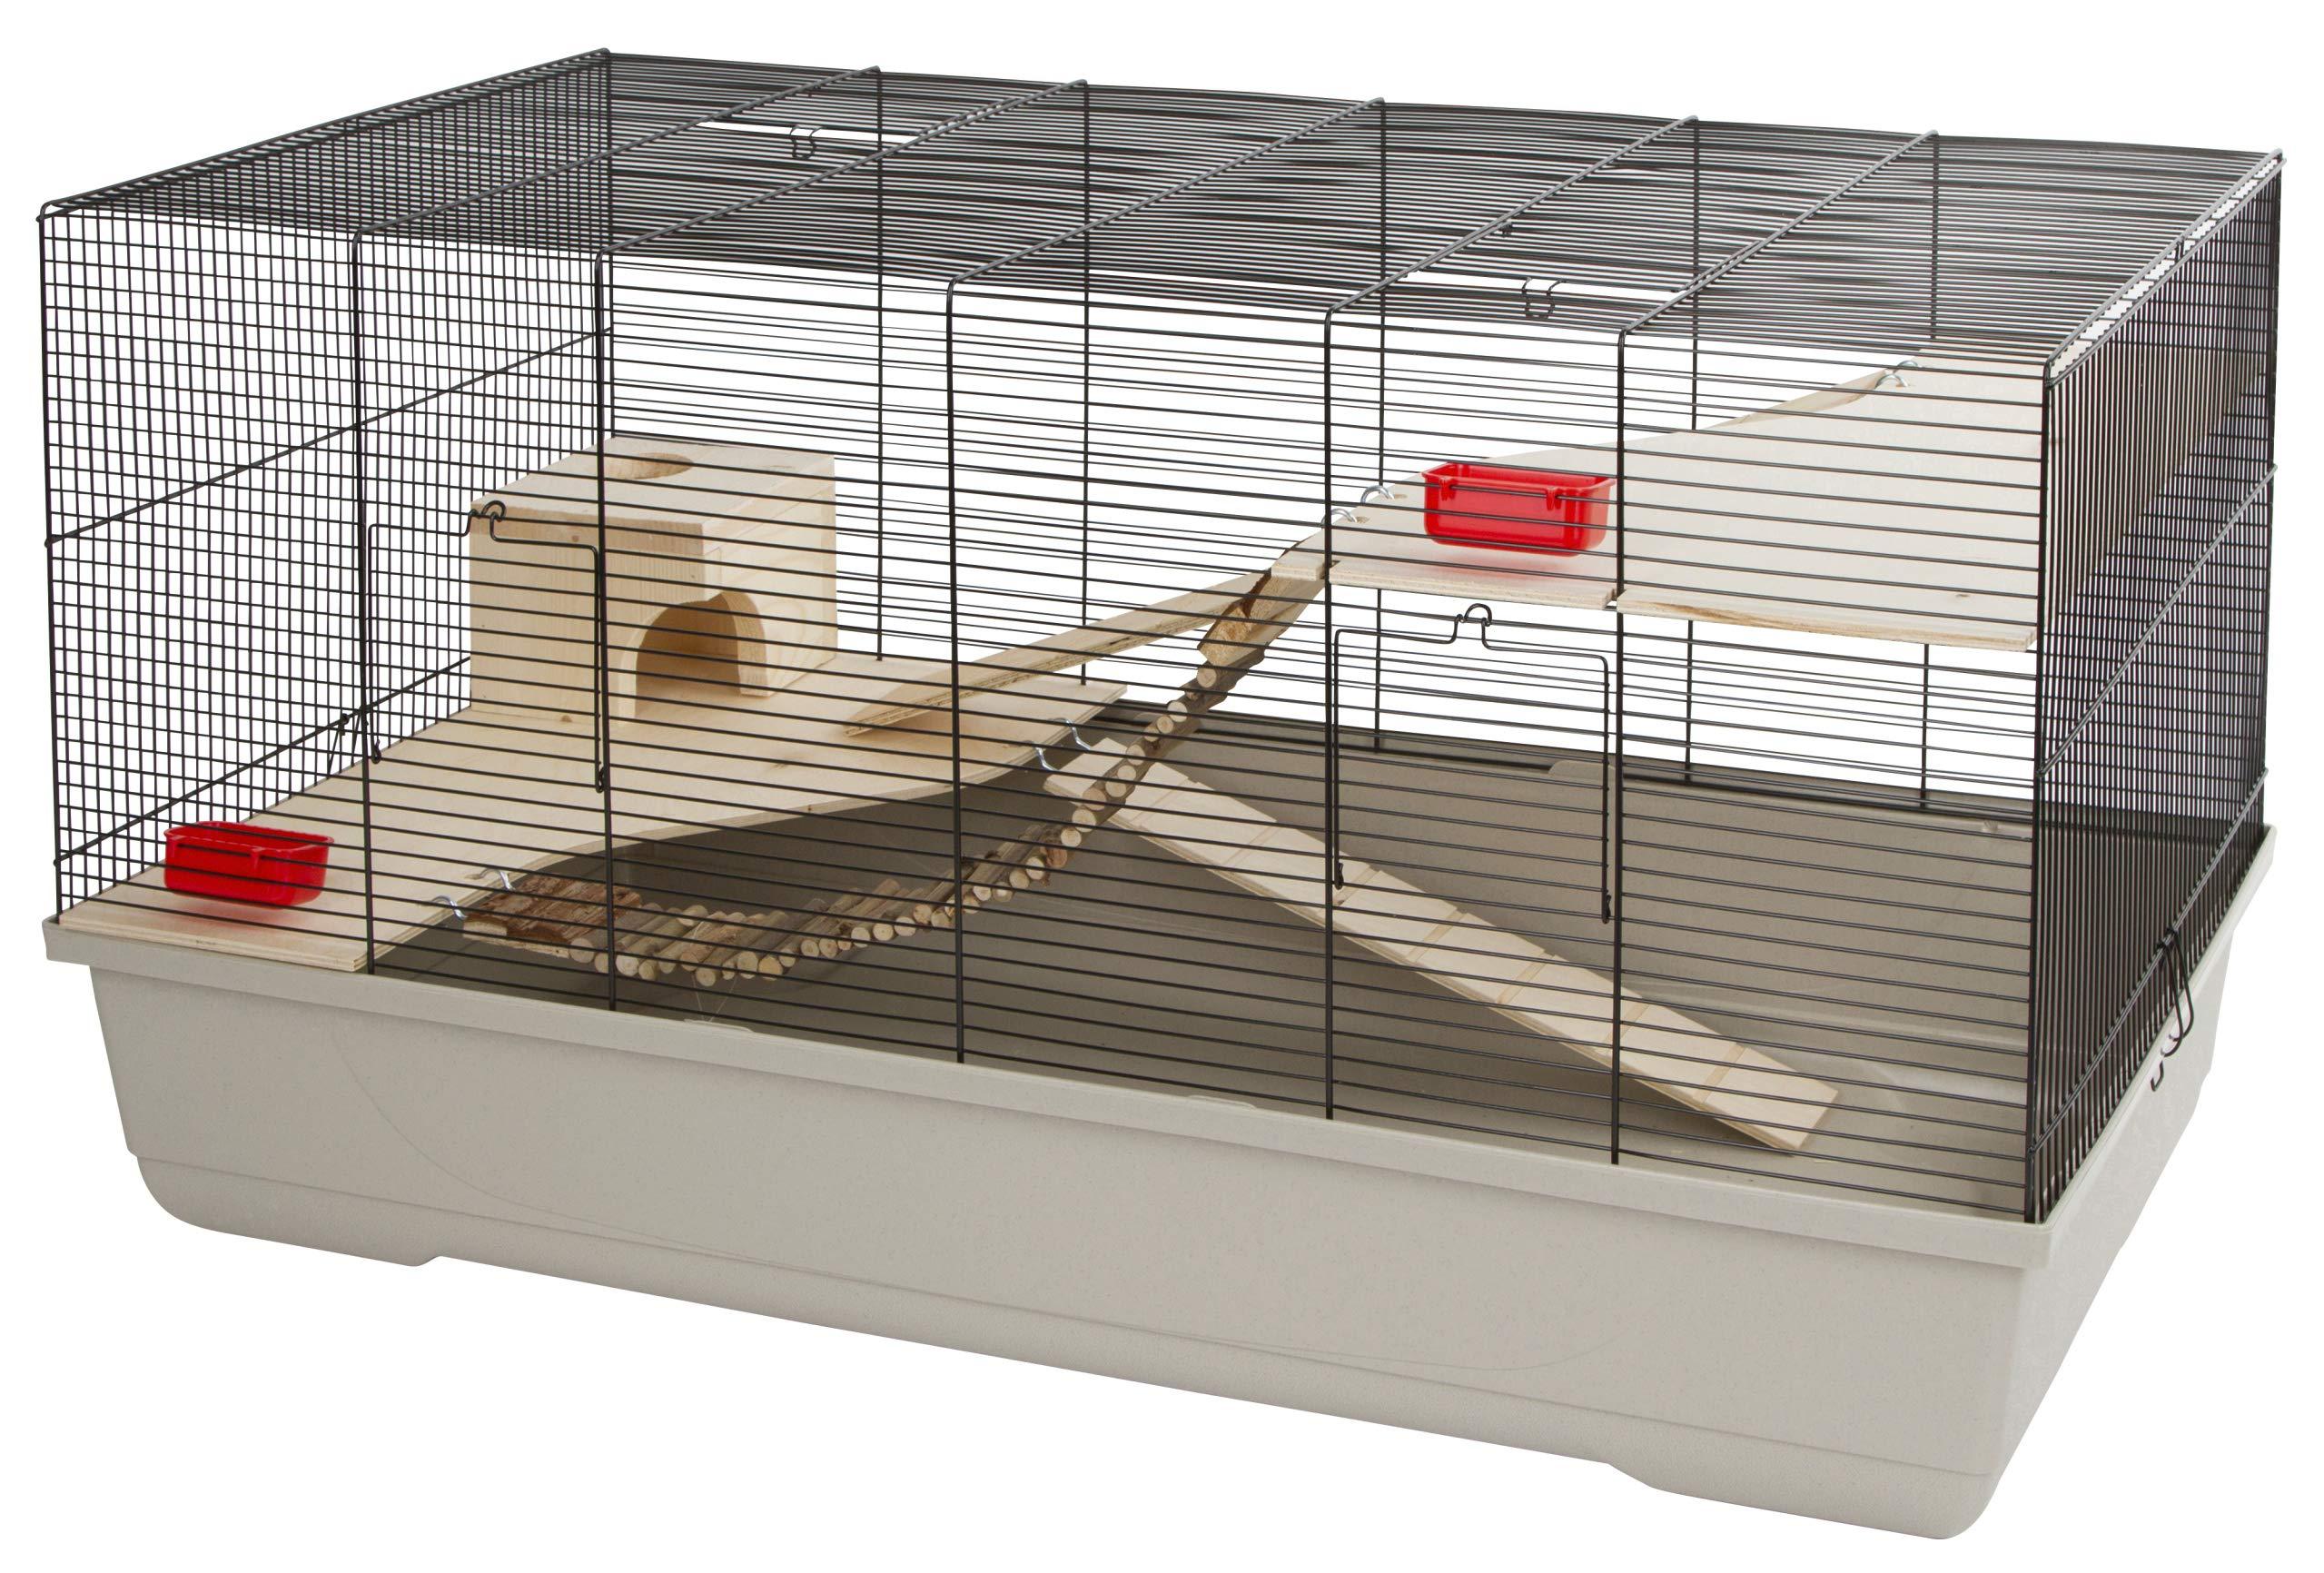 Kerbl Small Animal Cage Gabbia Hamster, 53 x 100 cm